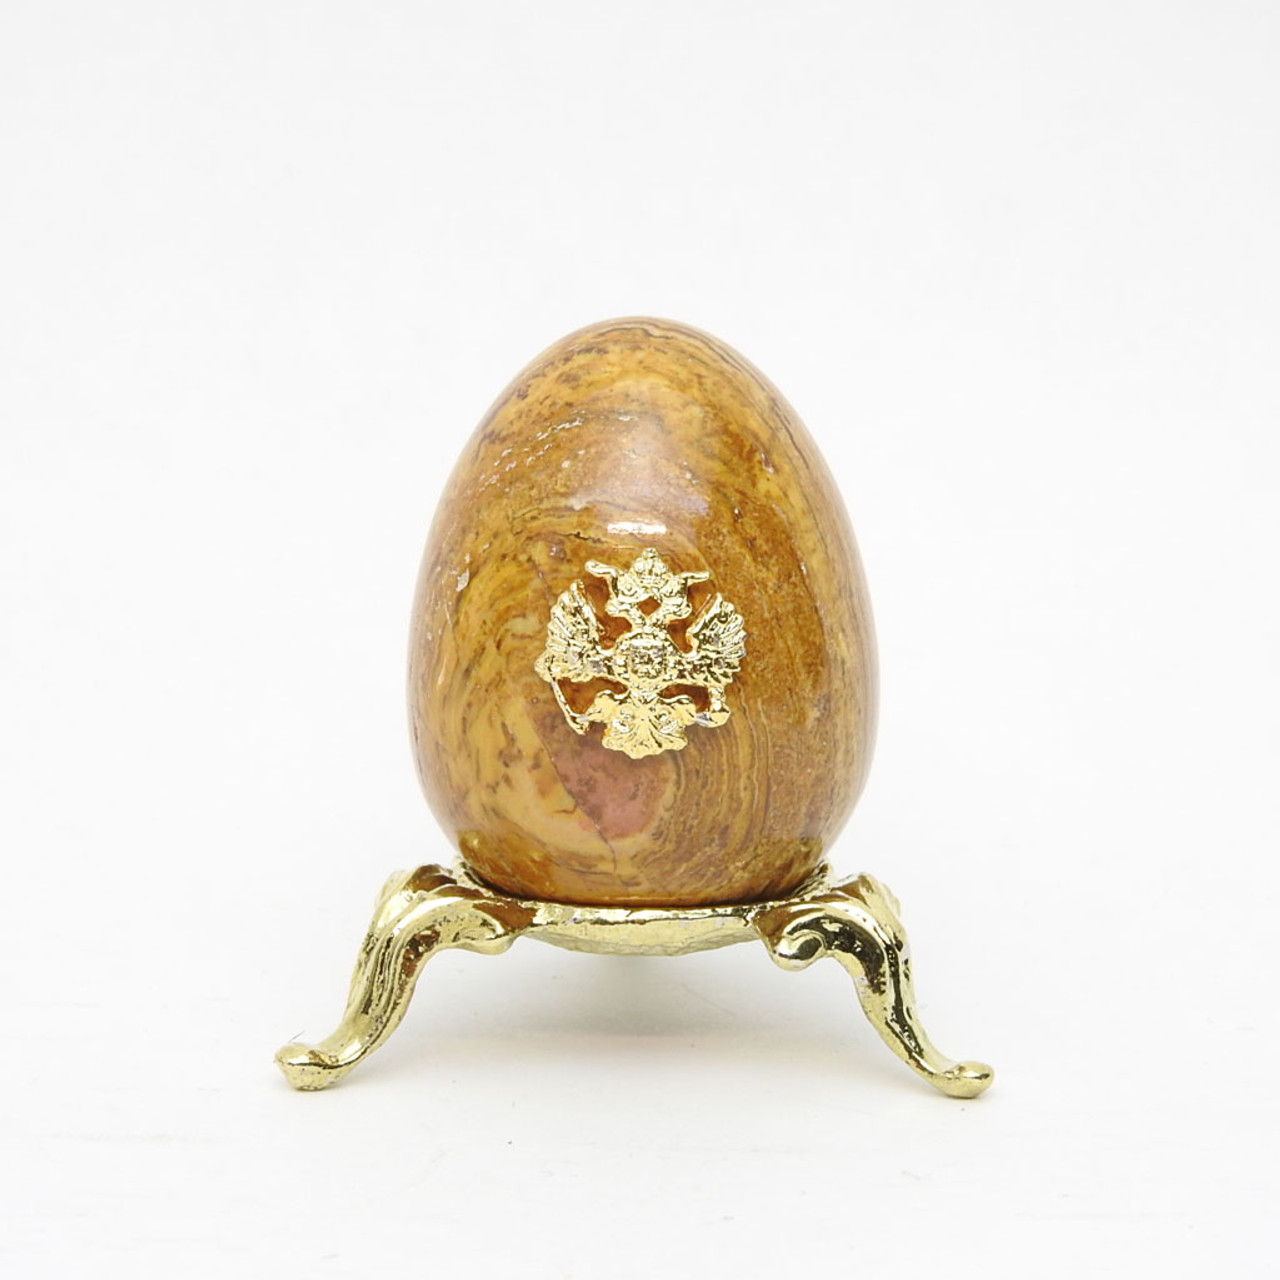 Imperial Russian Eagle Egg 22